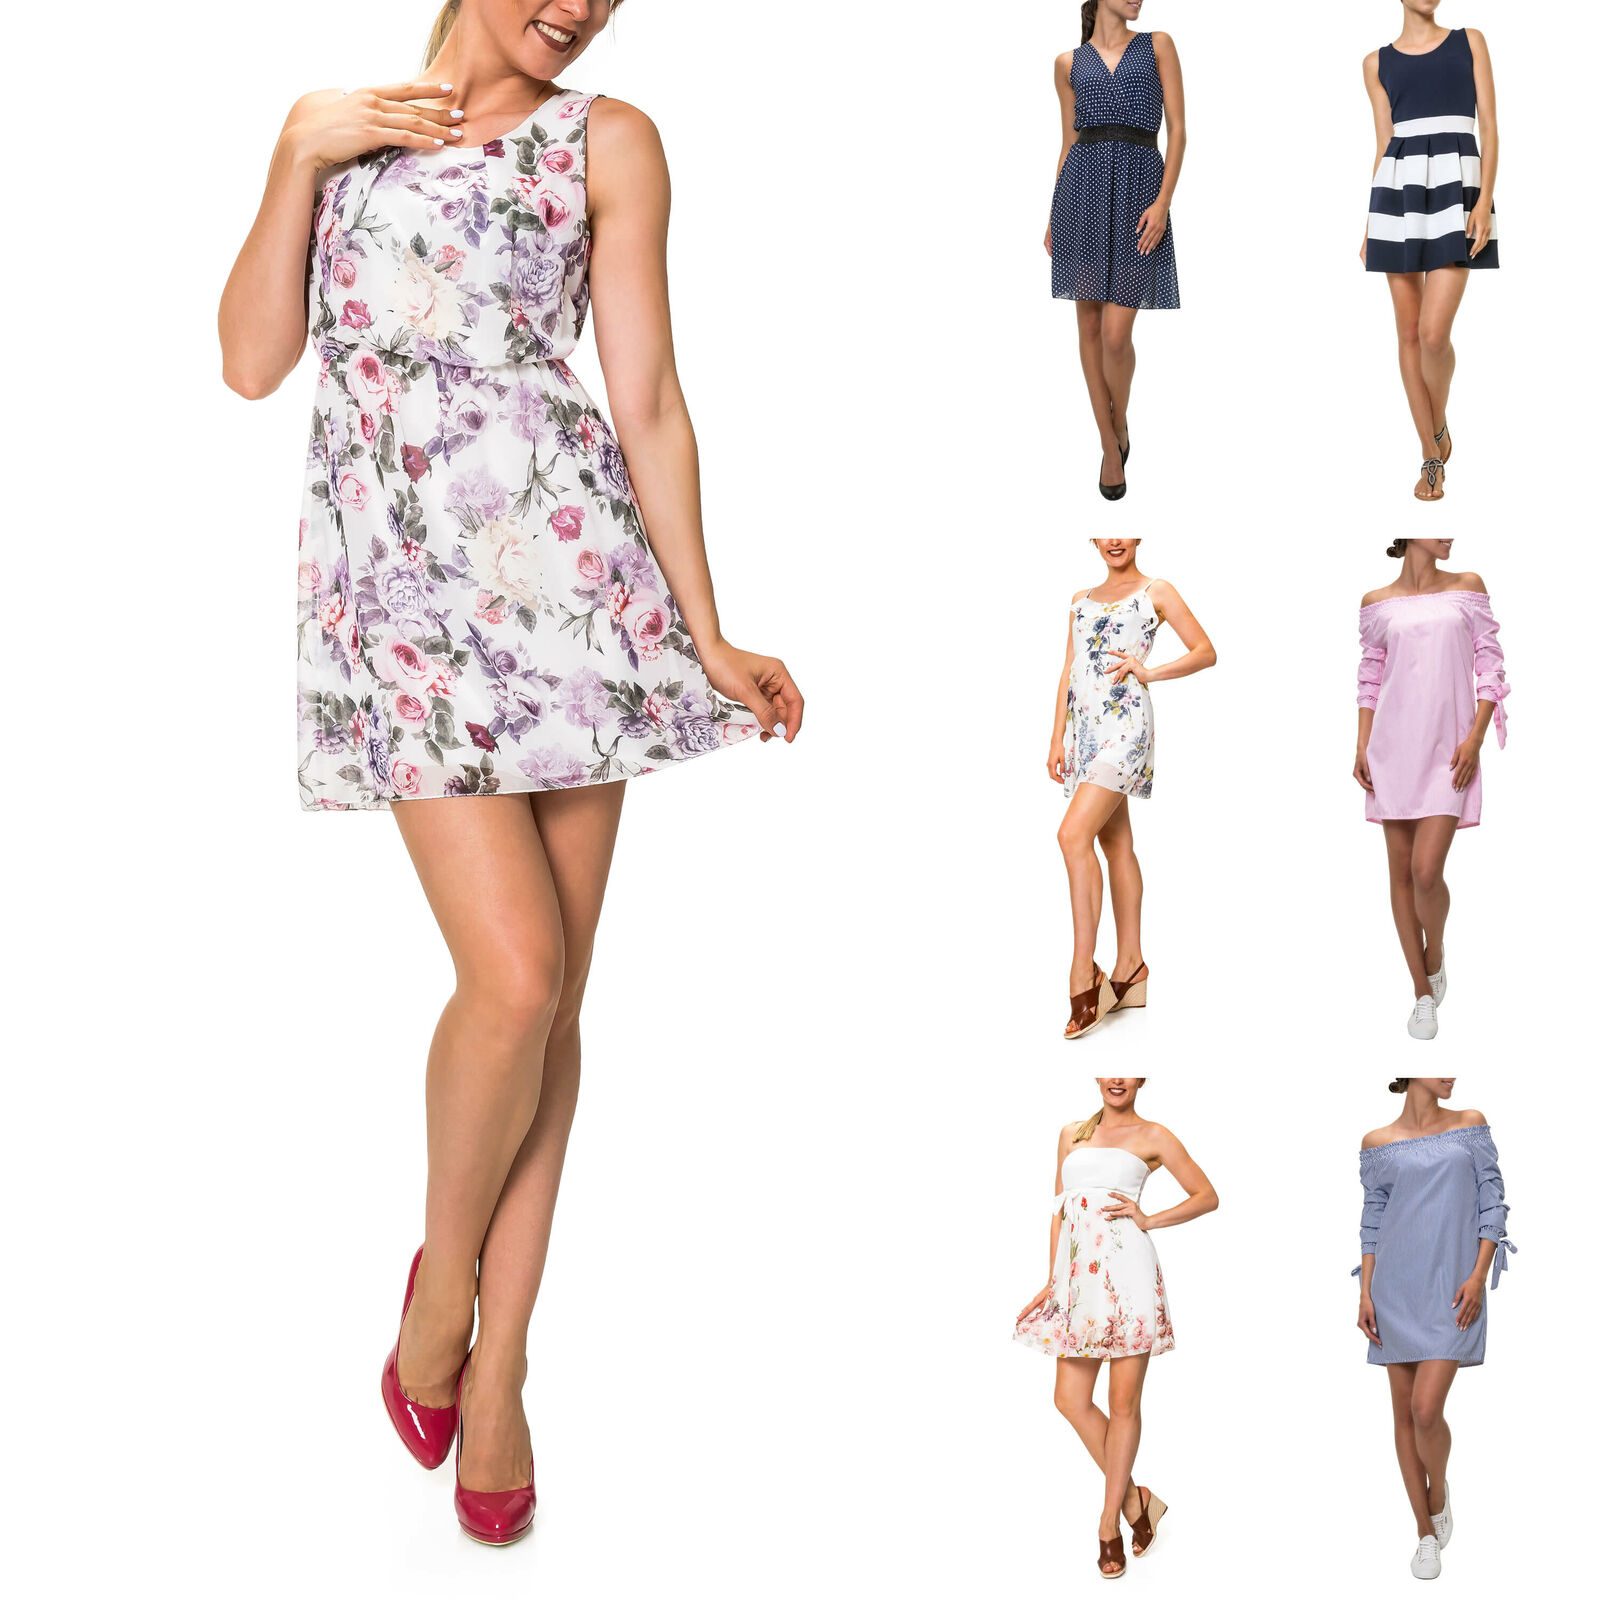 Hachiro Damen Kleid Sommerkleid Strandkleid Freizeitkleid Dress Cute Longshirt %